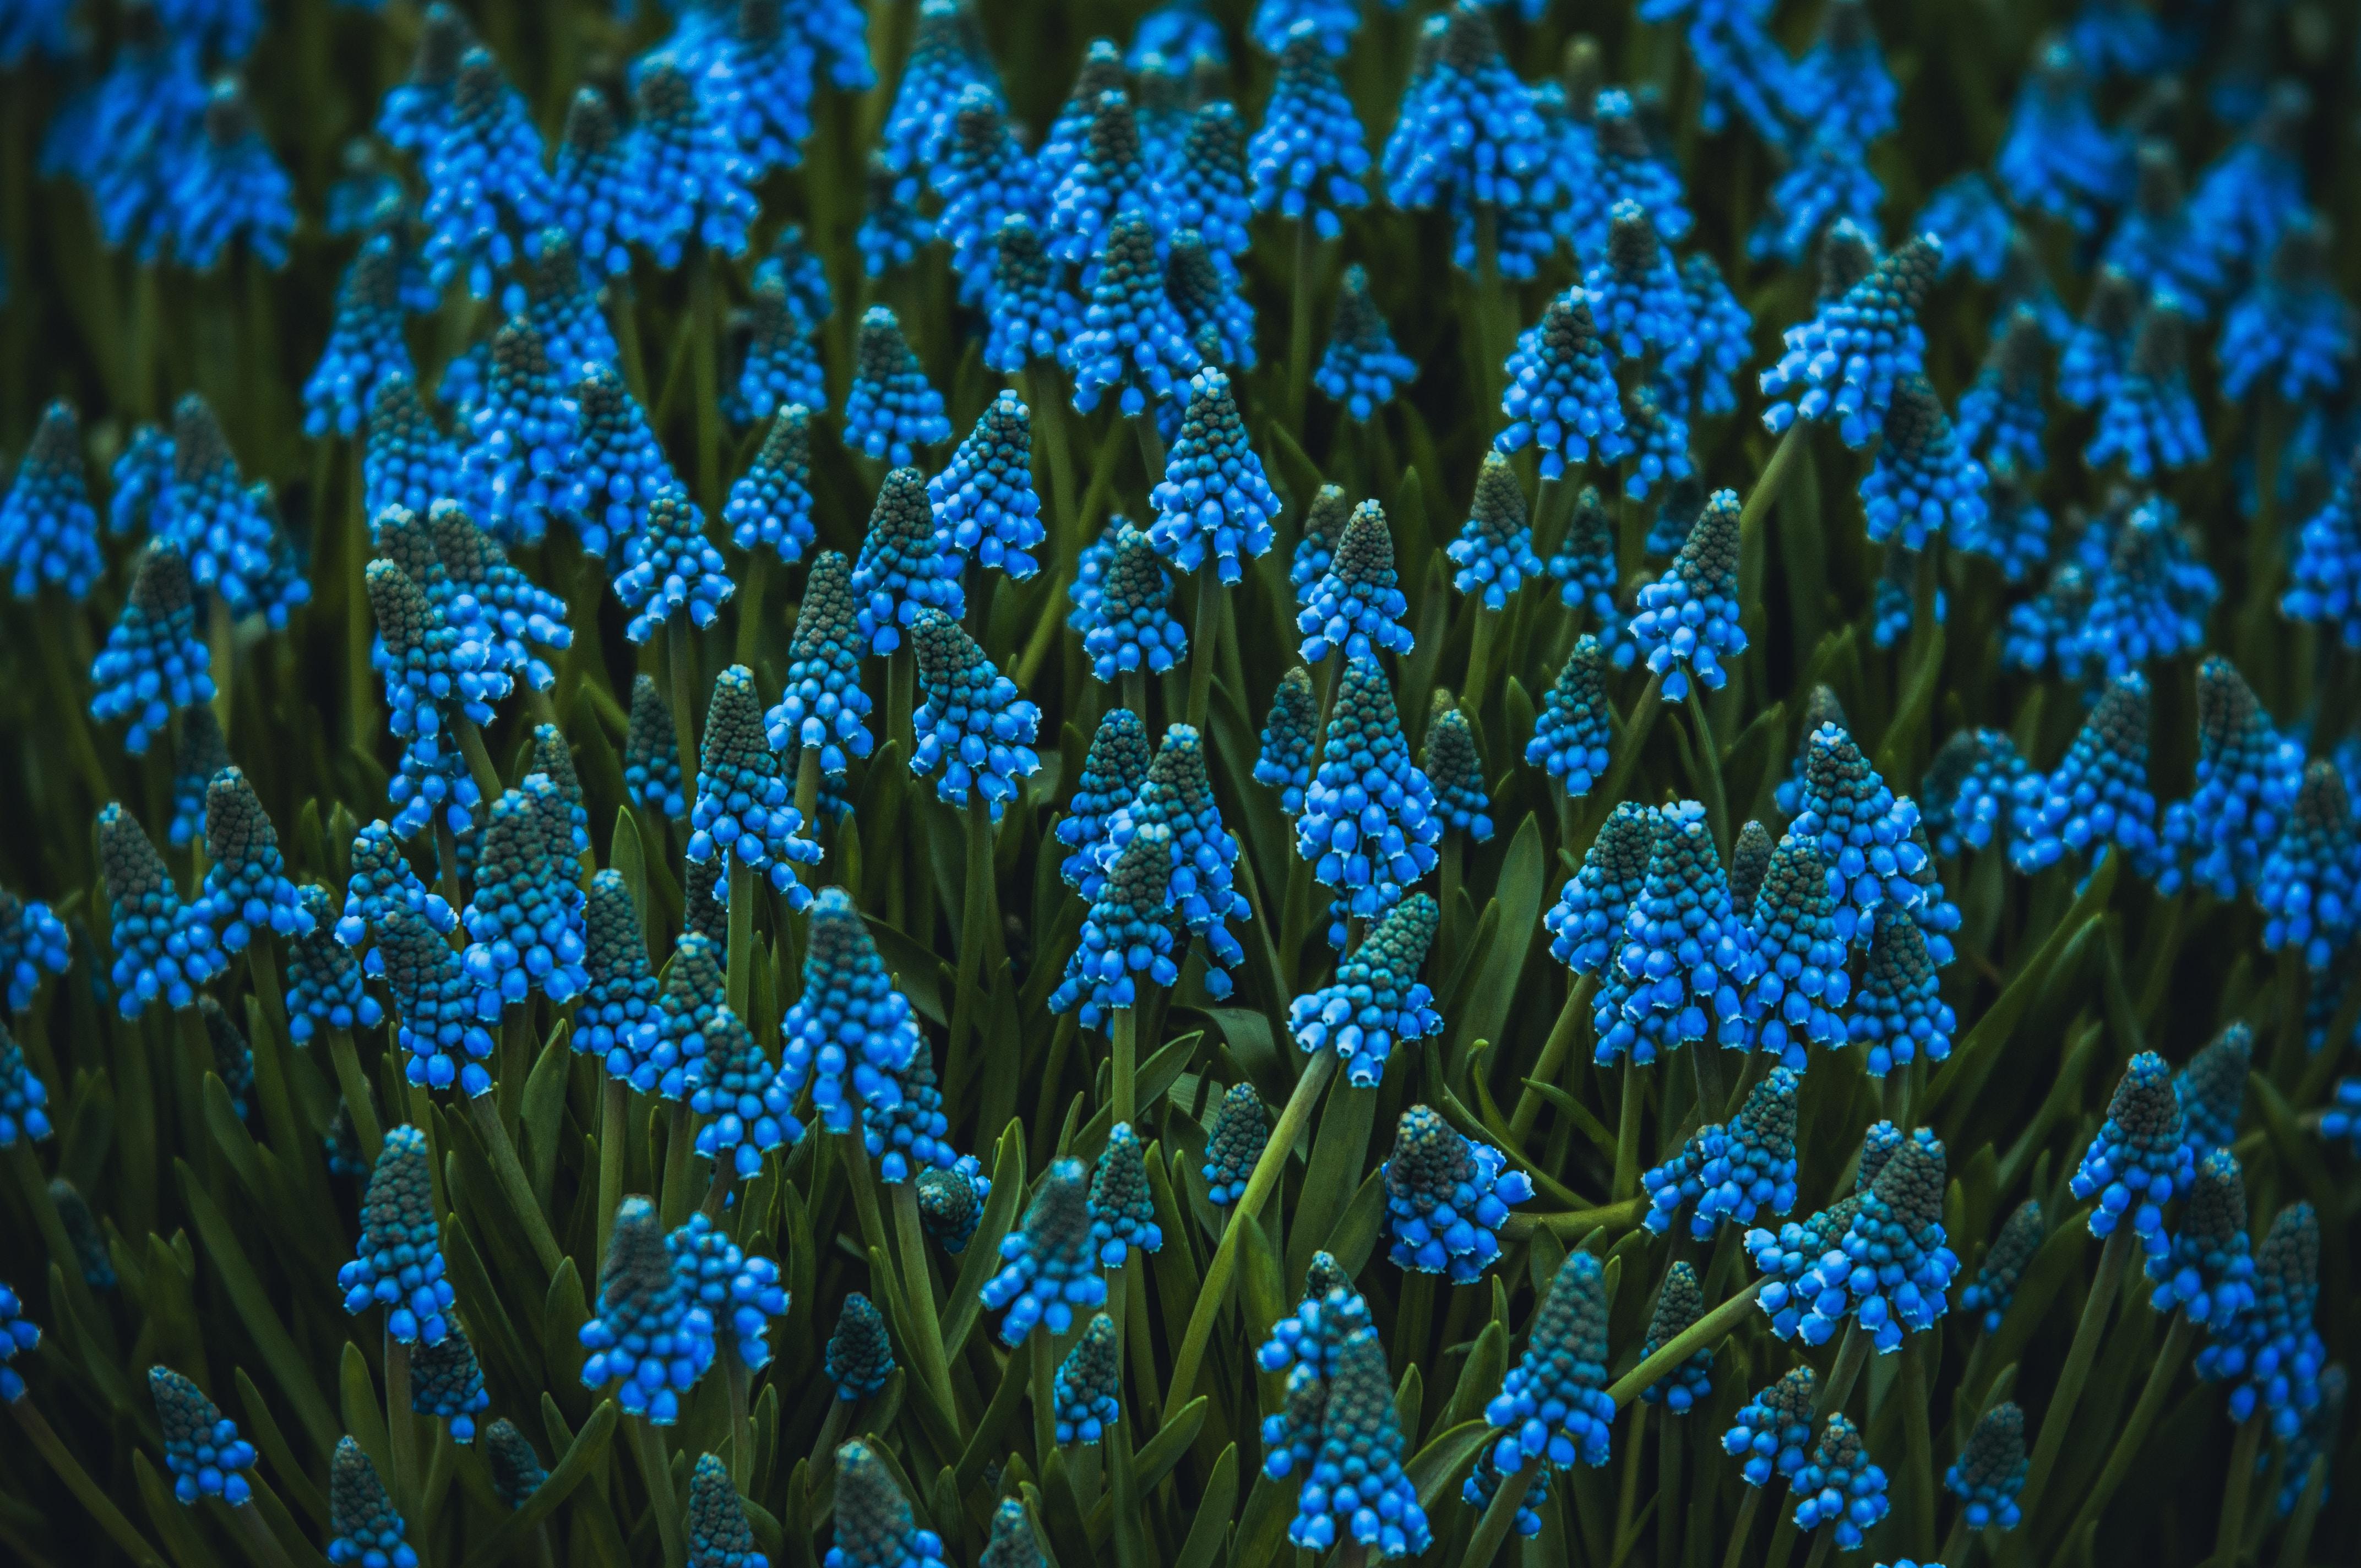 A Flower Stood stories